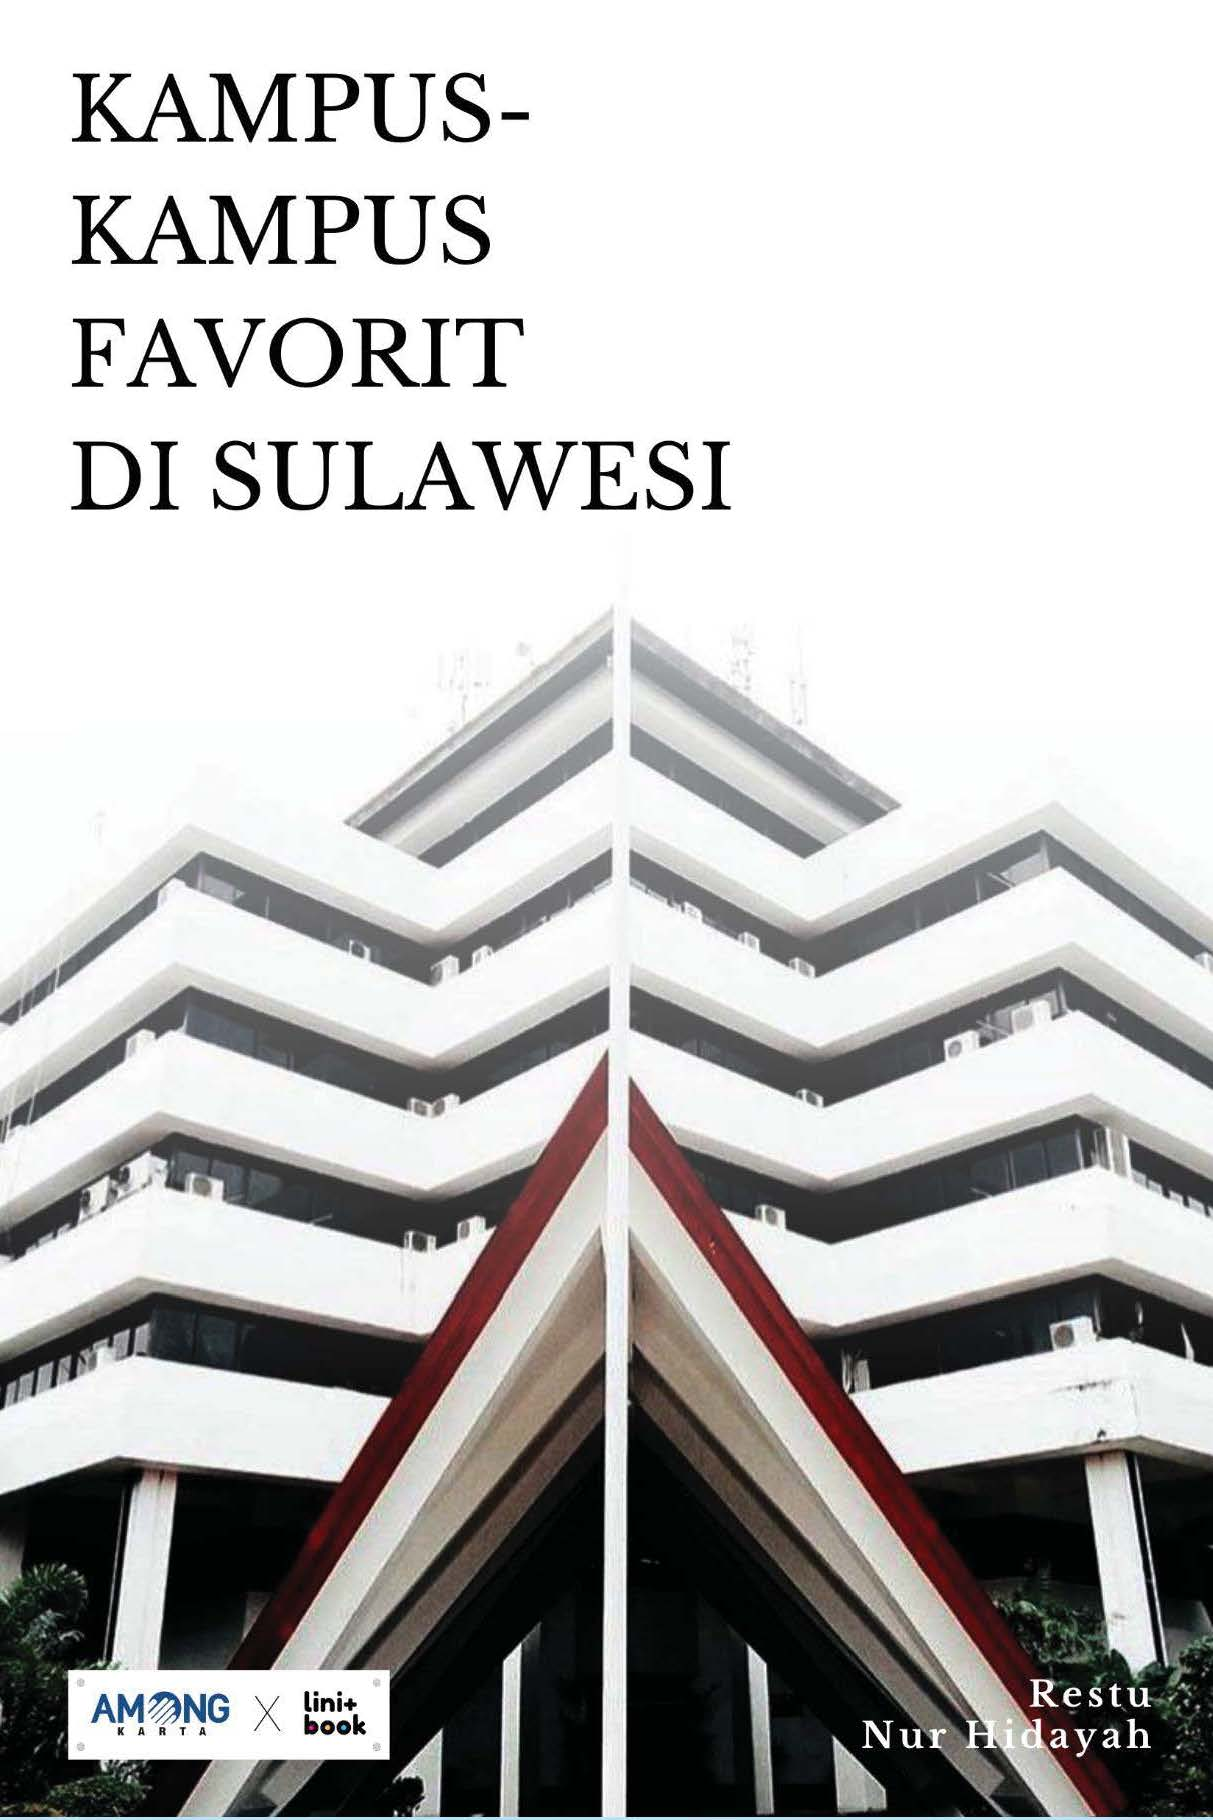 Kampus-kampus favorit di Sulawesi [sumber elektronis]